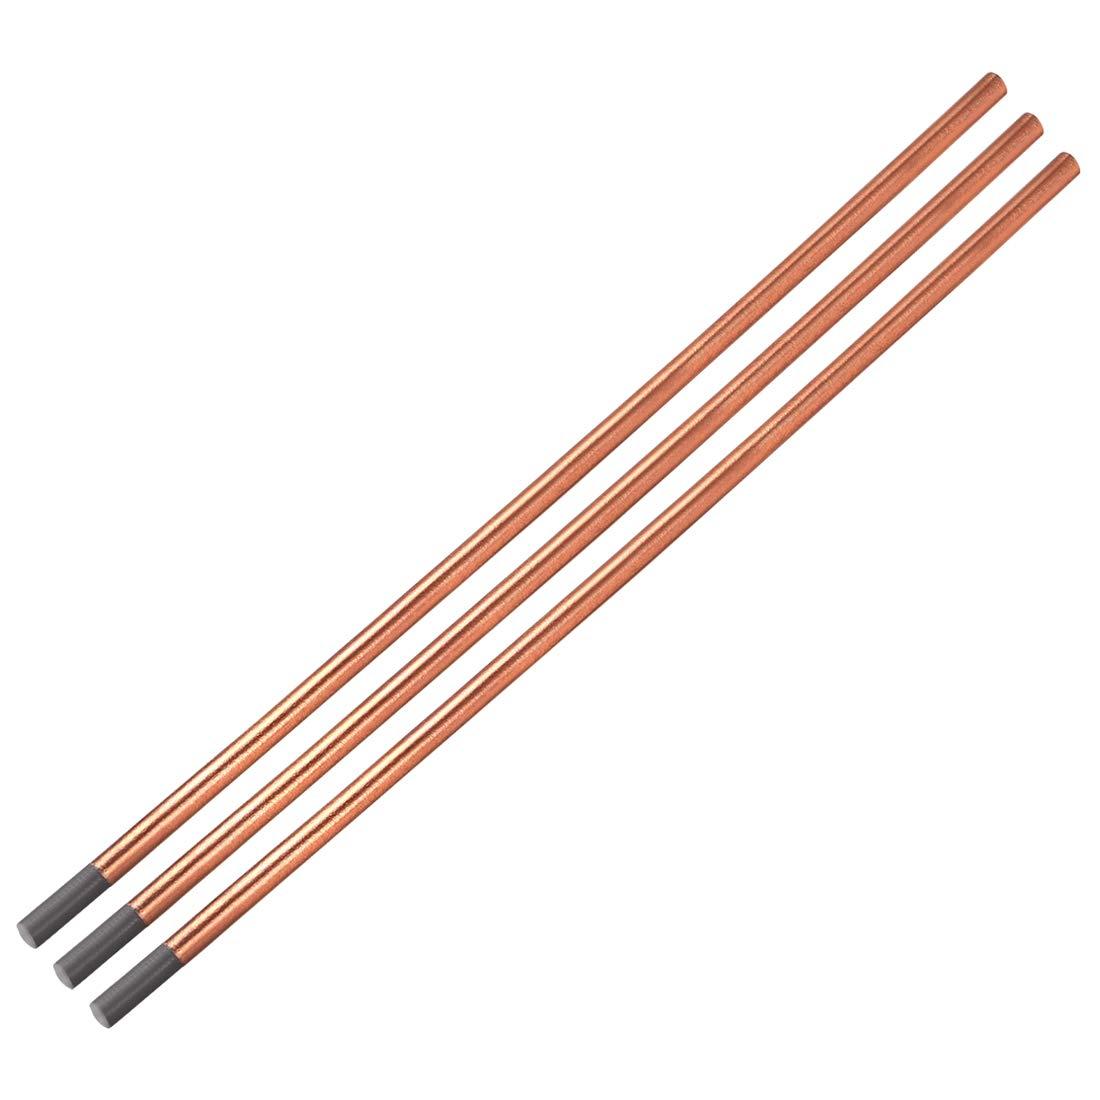 Sourcingmap electrodos de cobre 5//16 3 PCS Varillas de cocci/ón de carbono revestidas de cobre